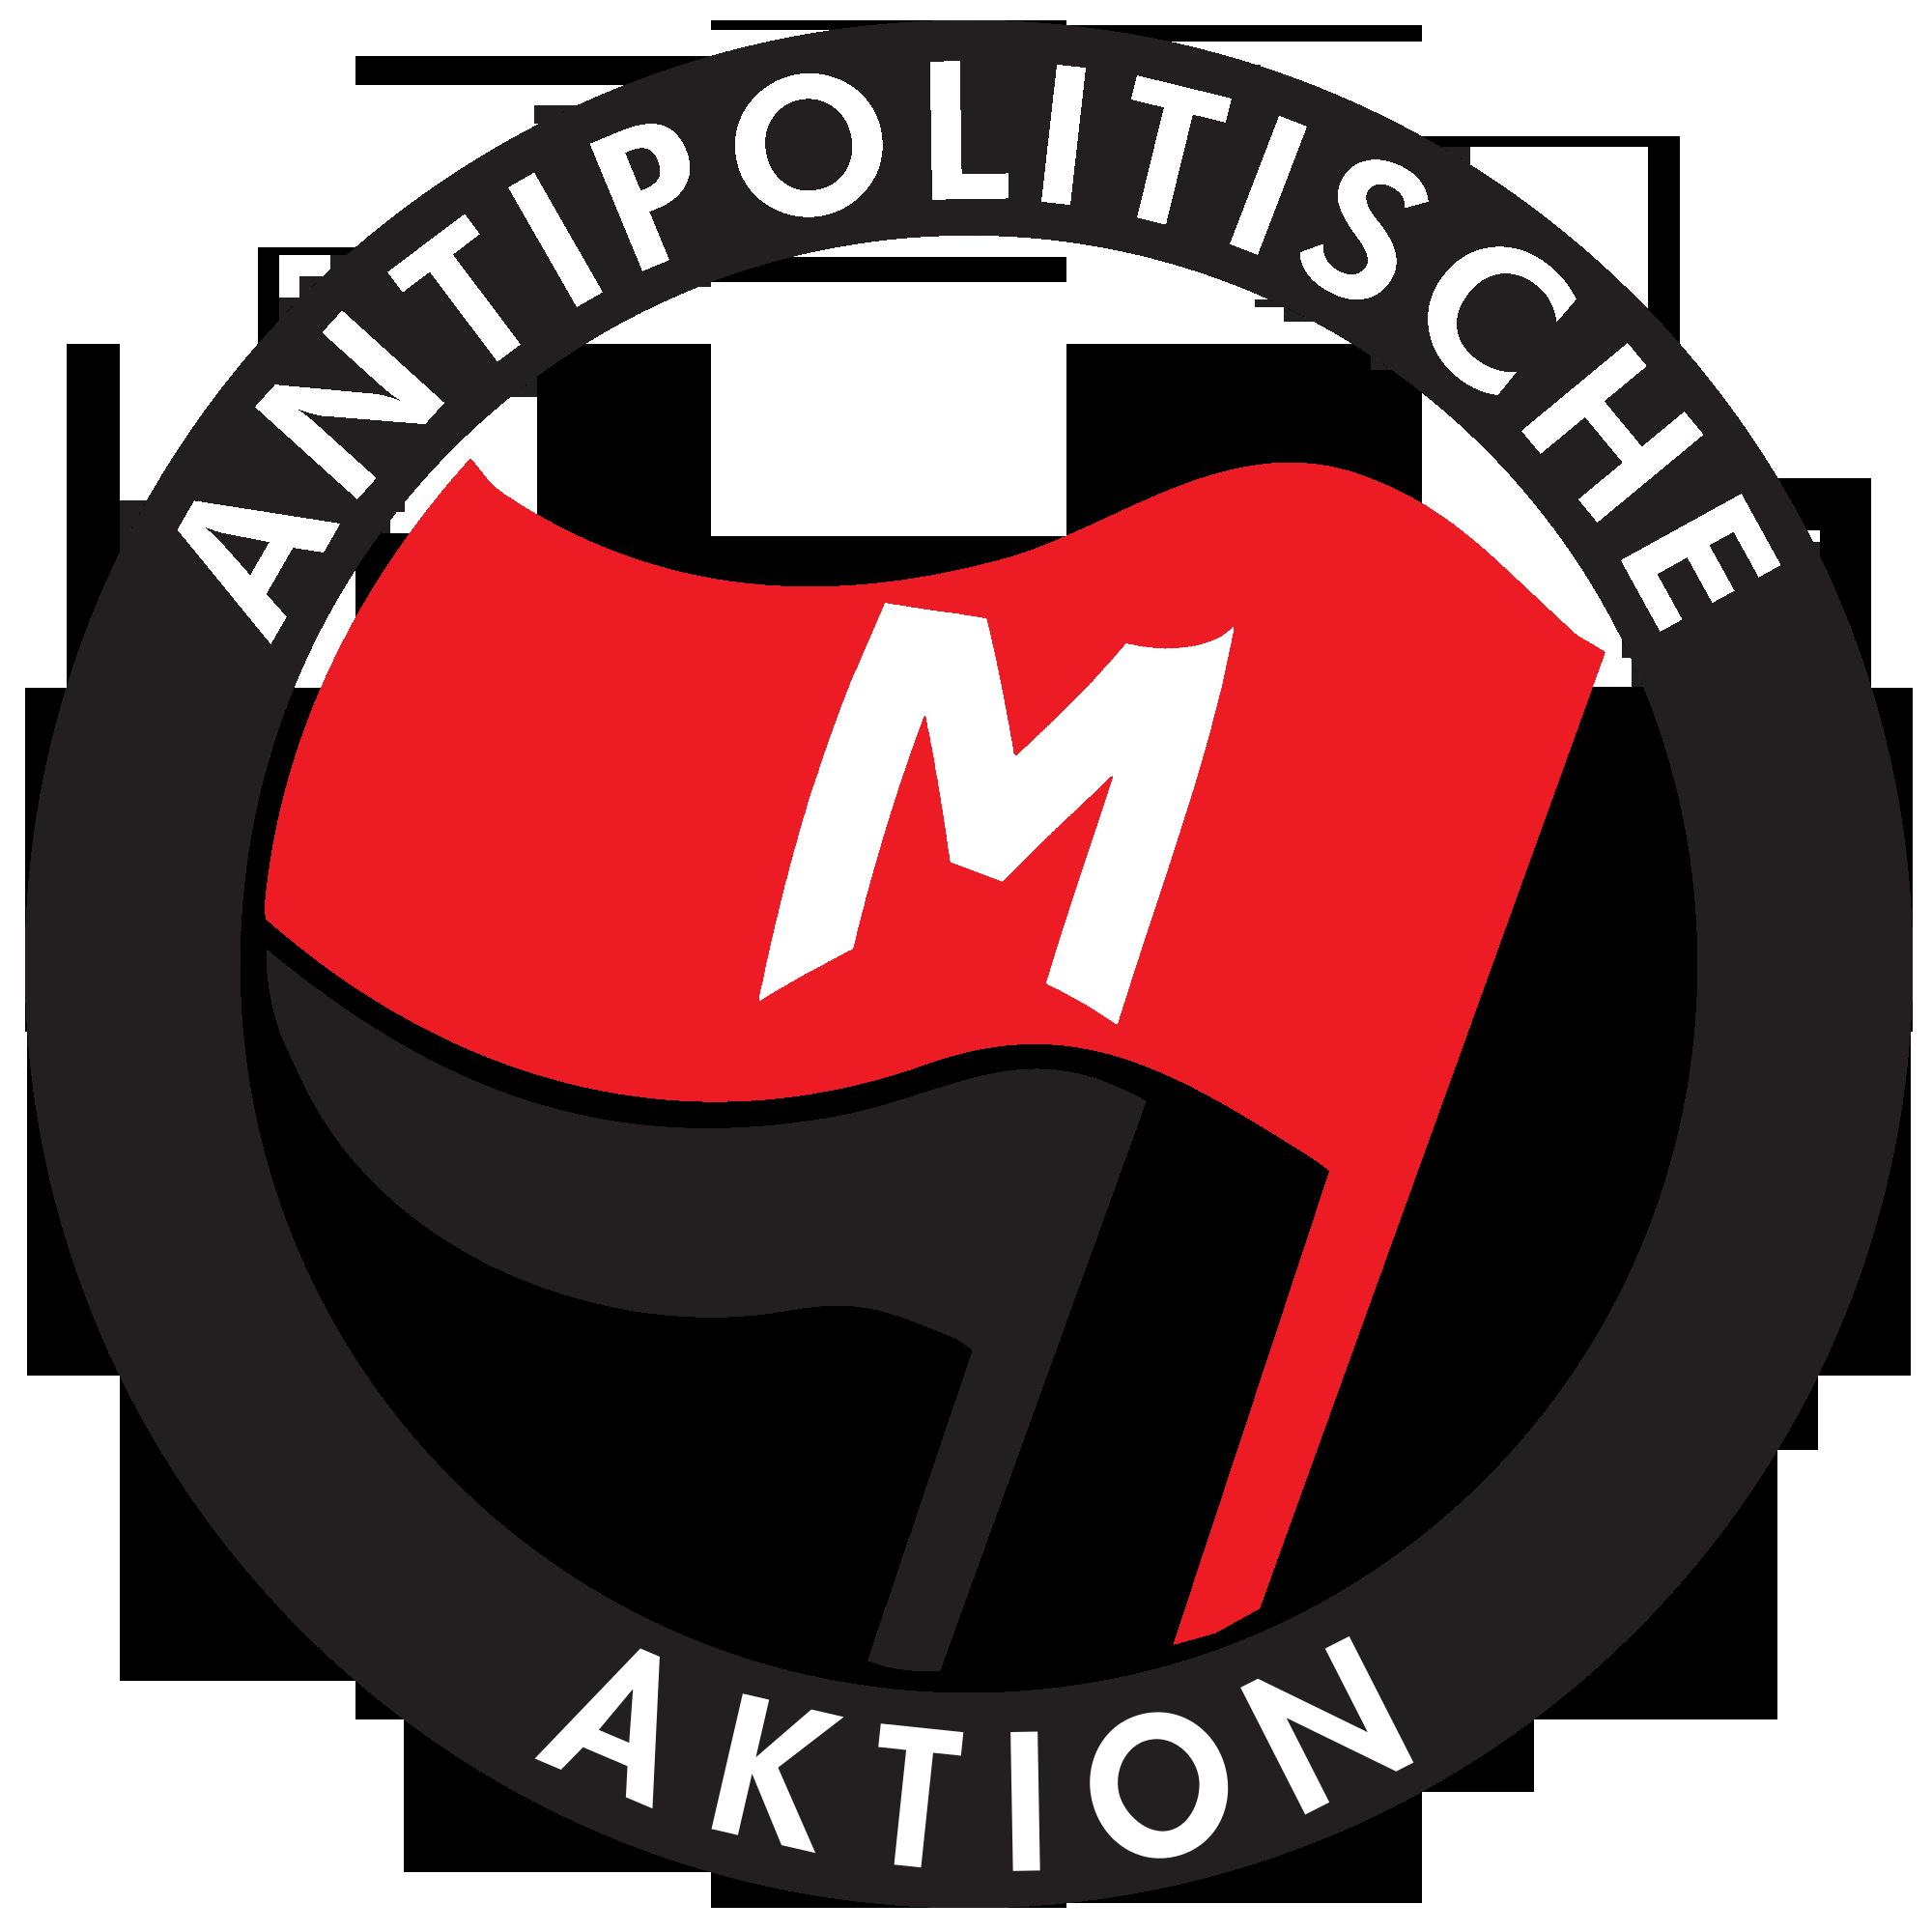 Antipolitische Aktion.png